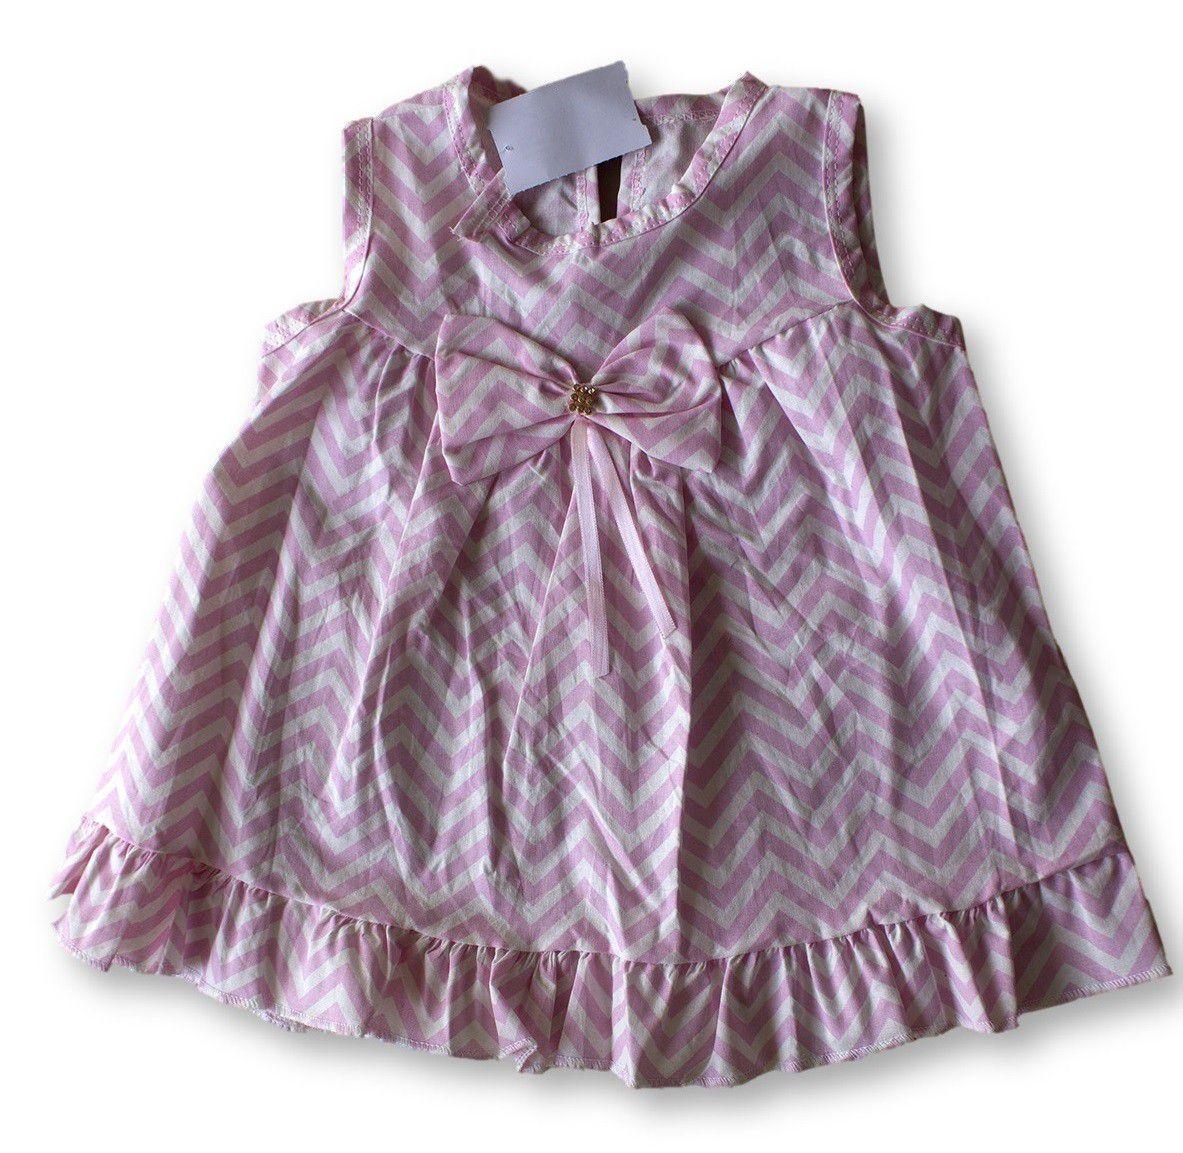 Vestido Bolero Bebê Recém Nascido Feminino Menina Cod 9086